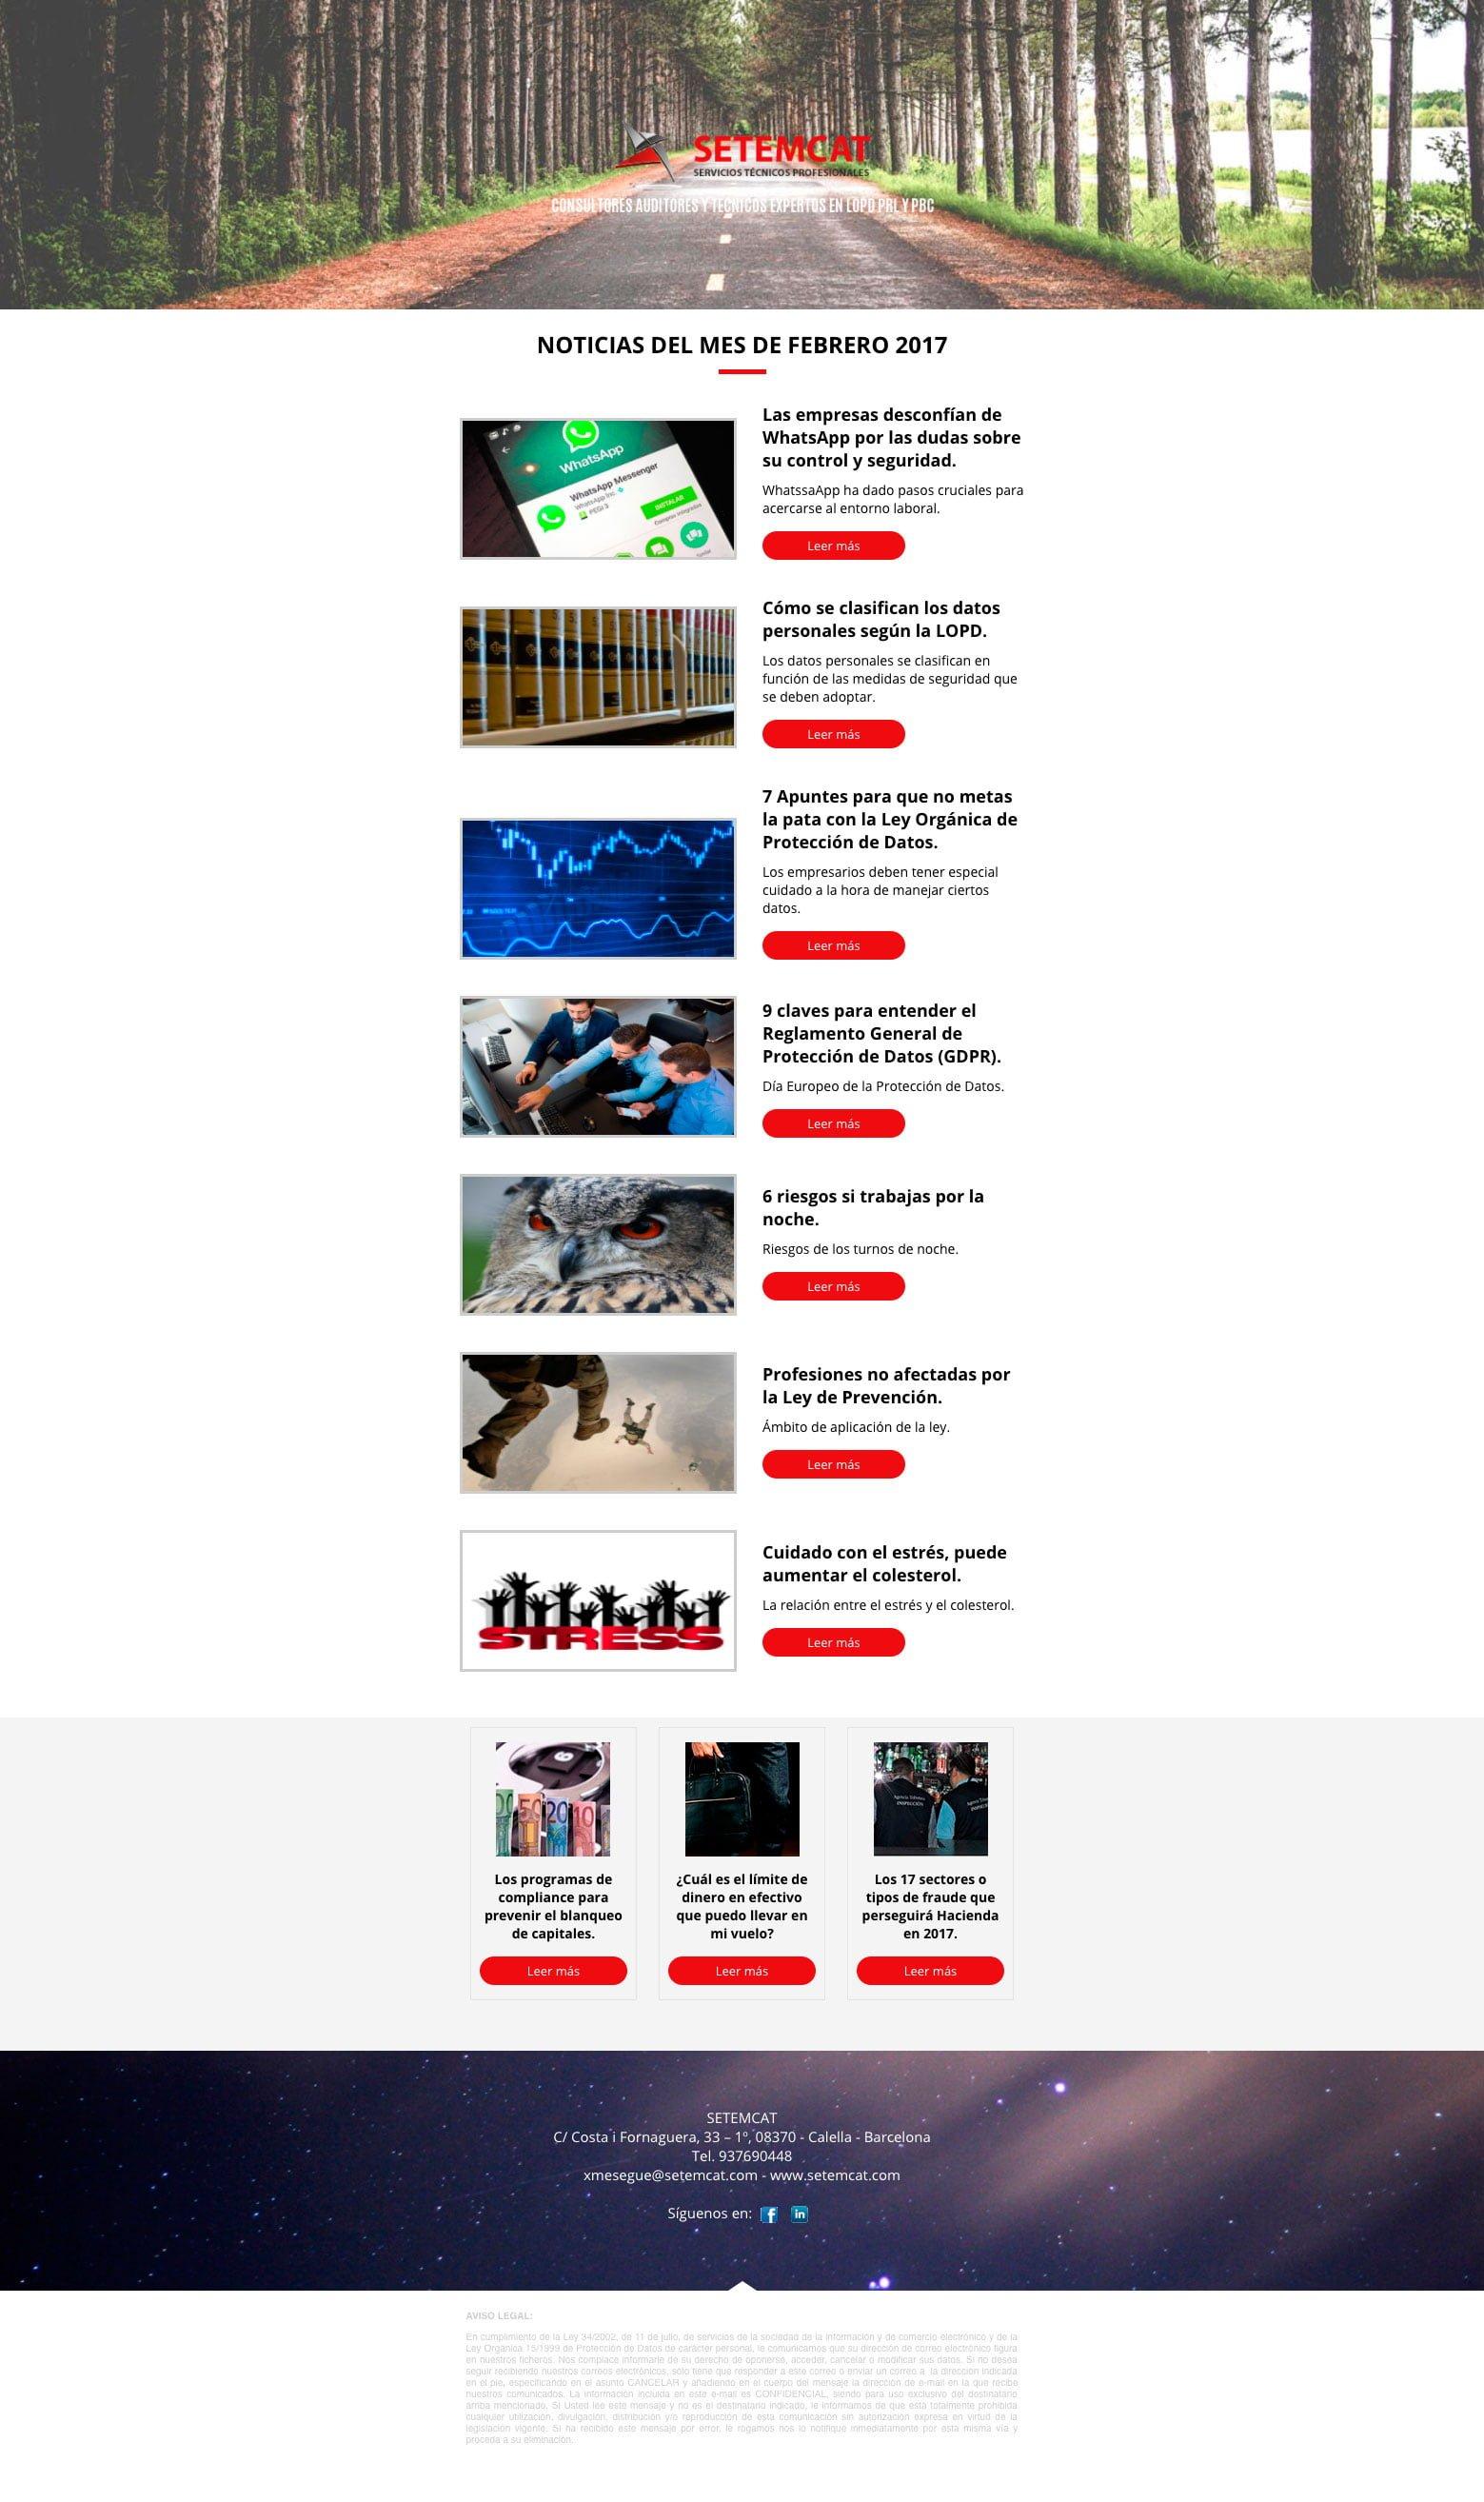 Boletín de Notícias Setemcat - Febrero 2017